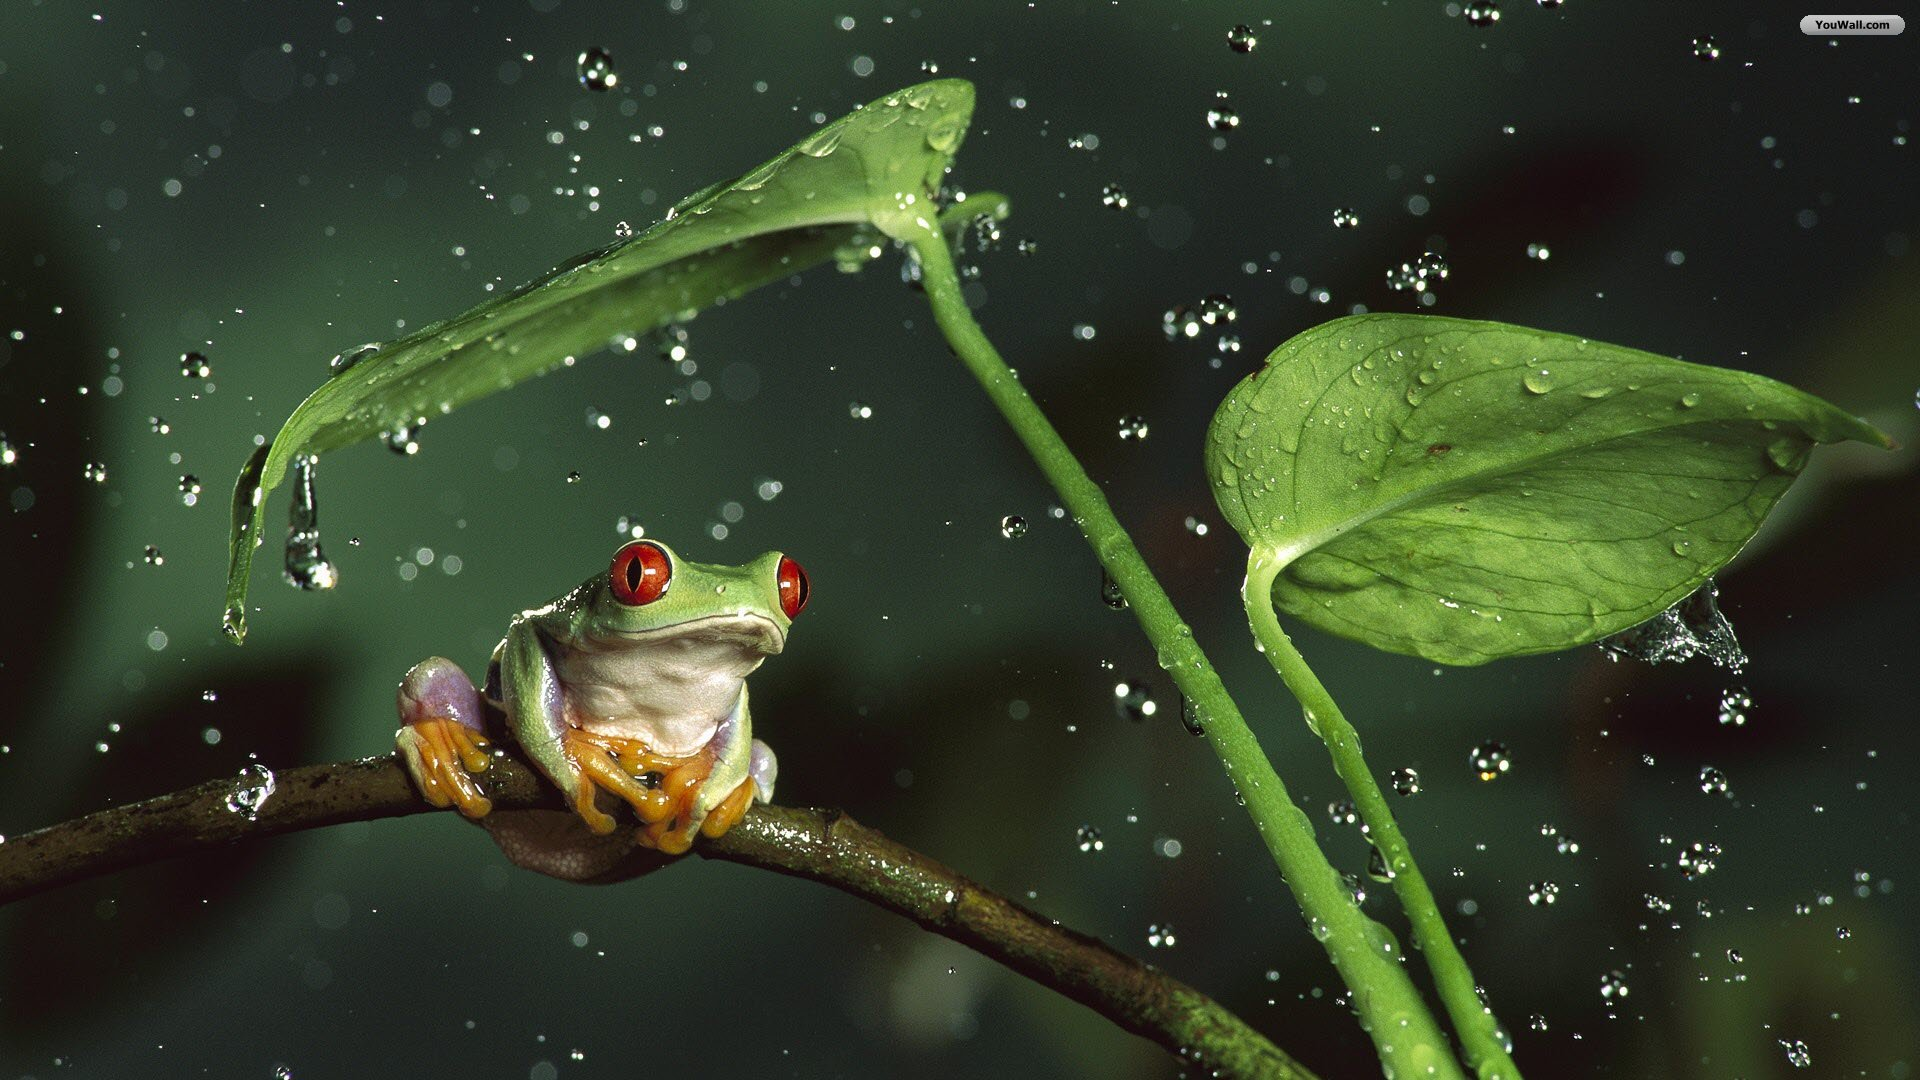 Under Rain Wallpaper HD wallpaper   Green Frog Under Rain Wallpaper 1920x1080